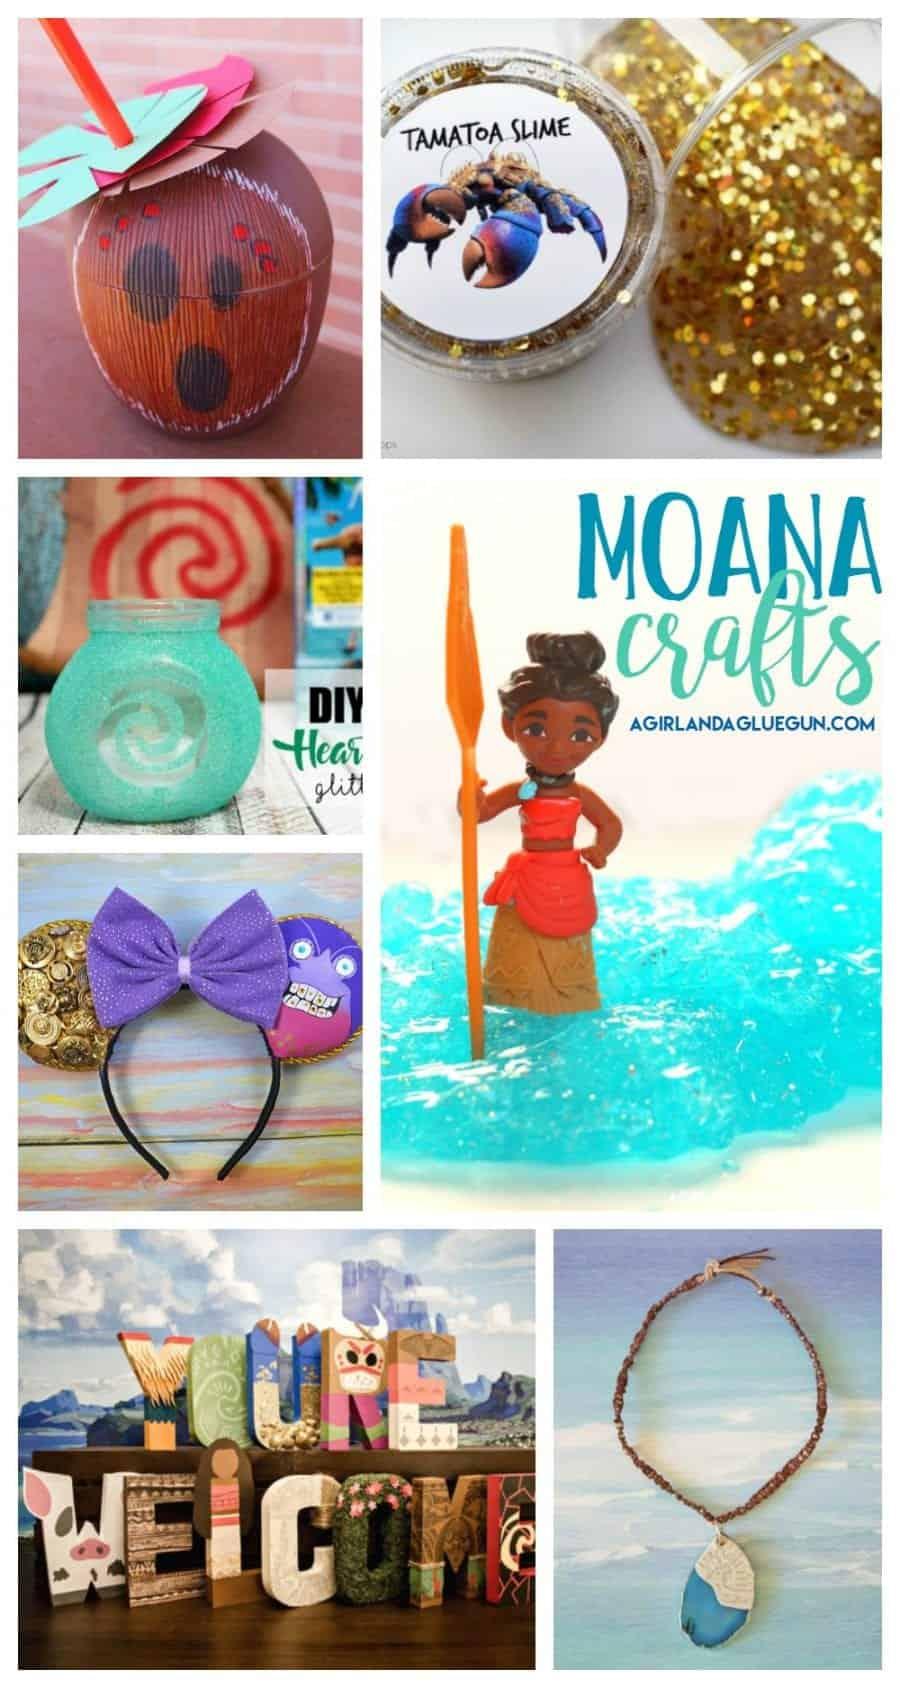 Moana crafts! - A girl and a glue gun